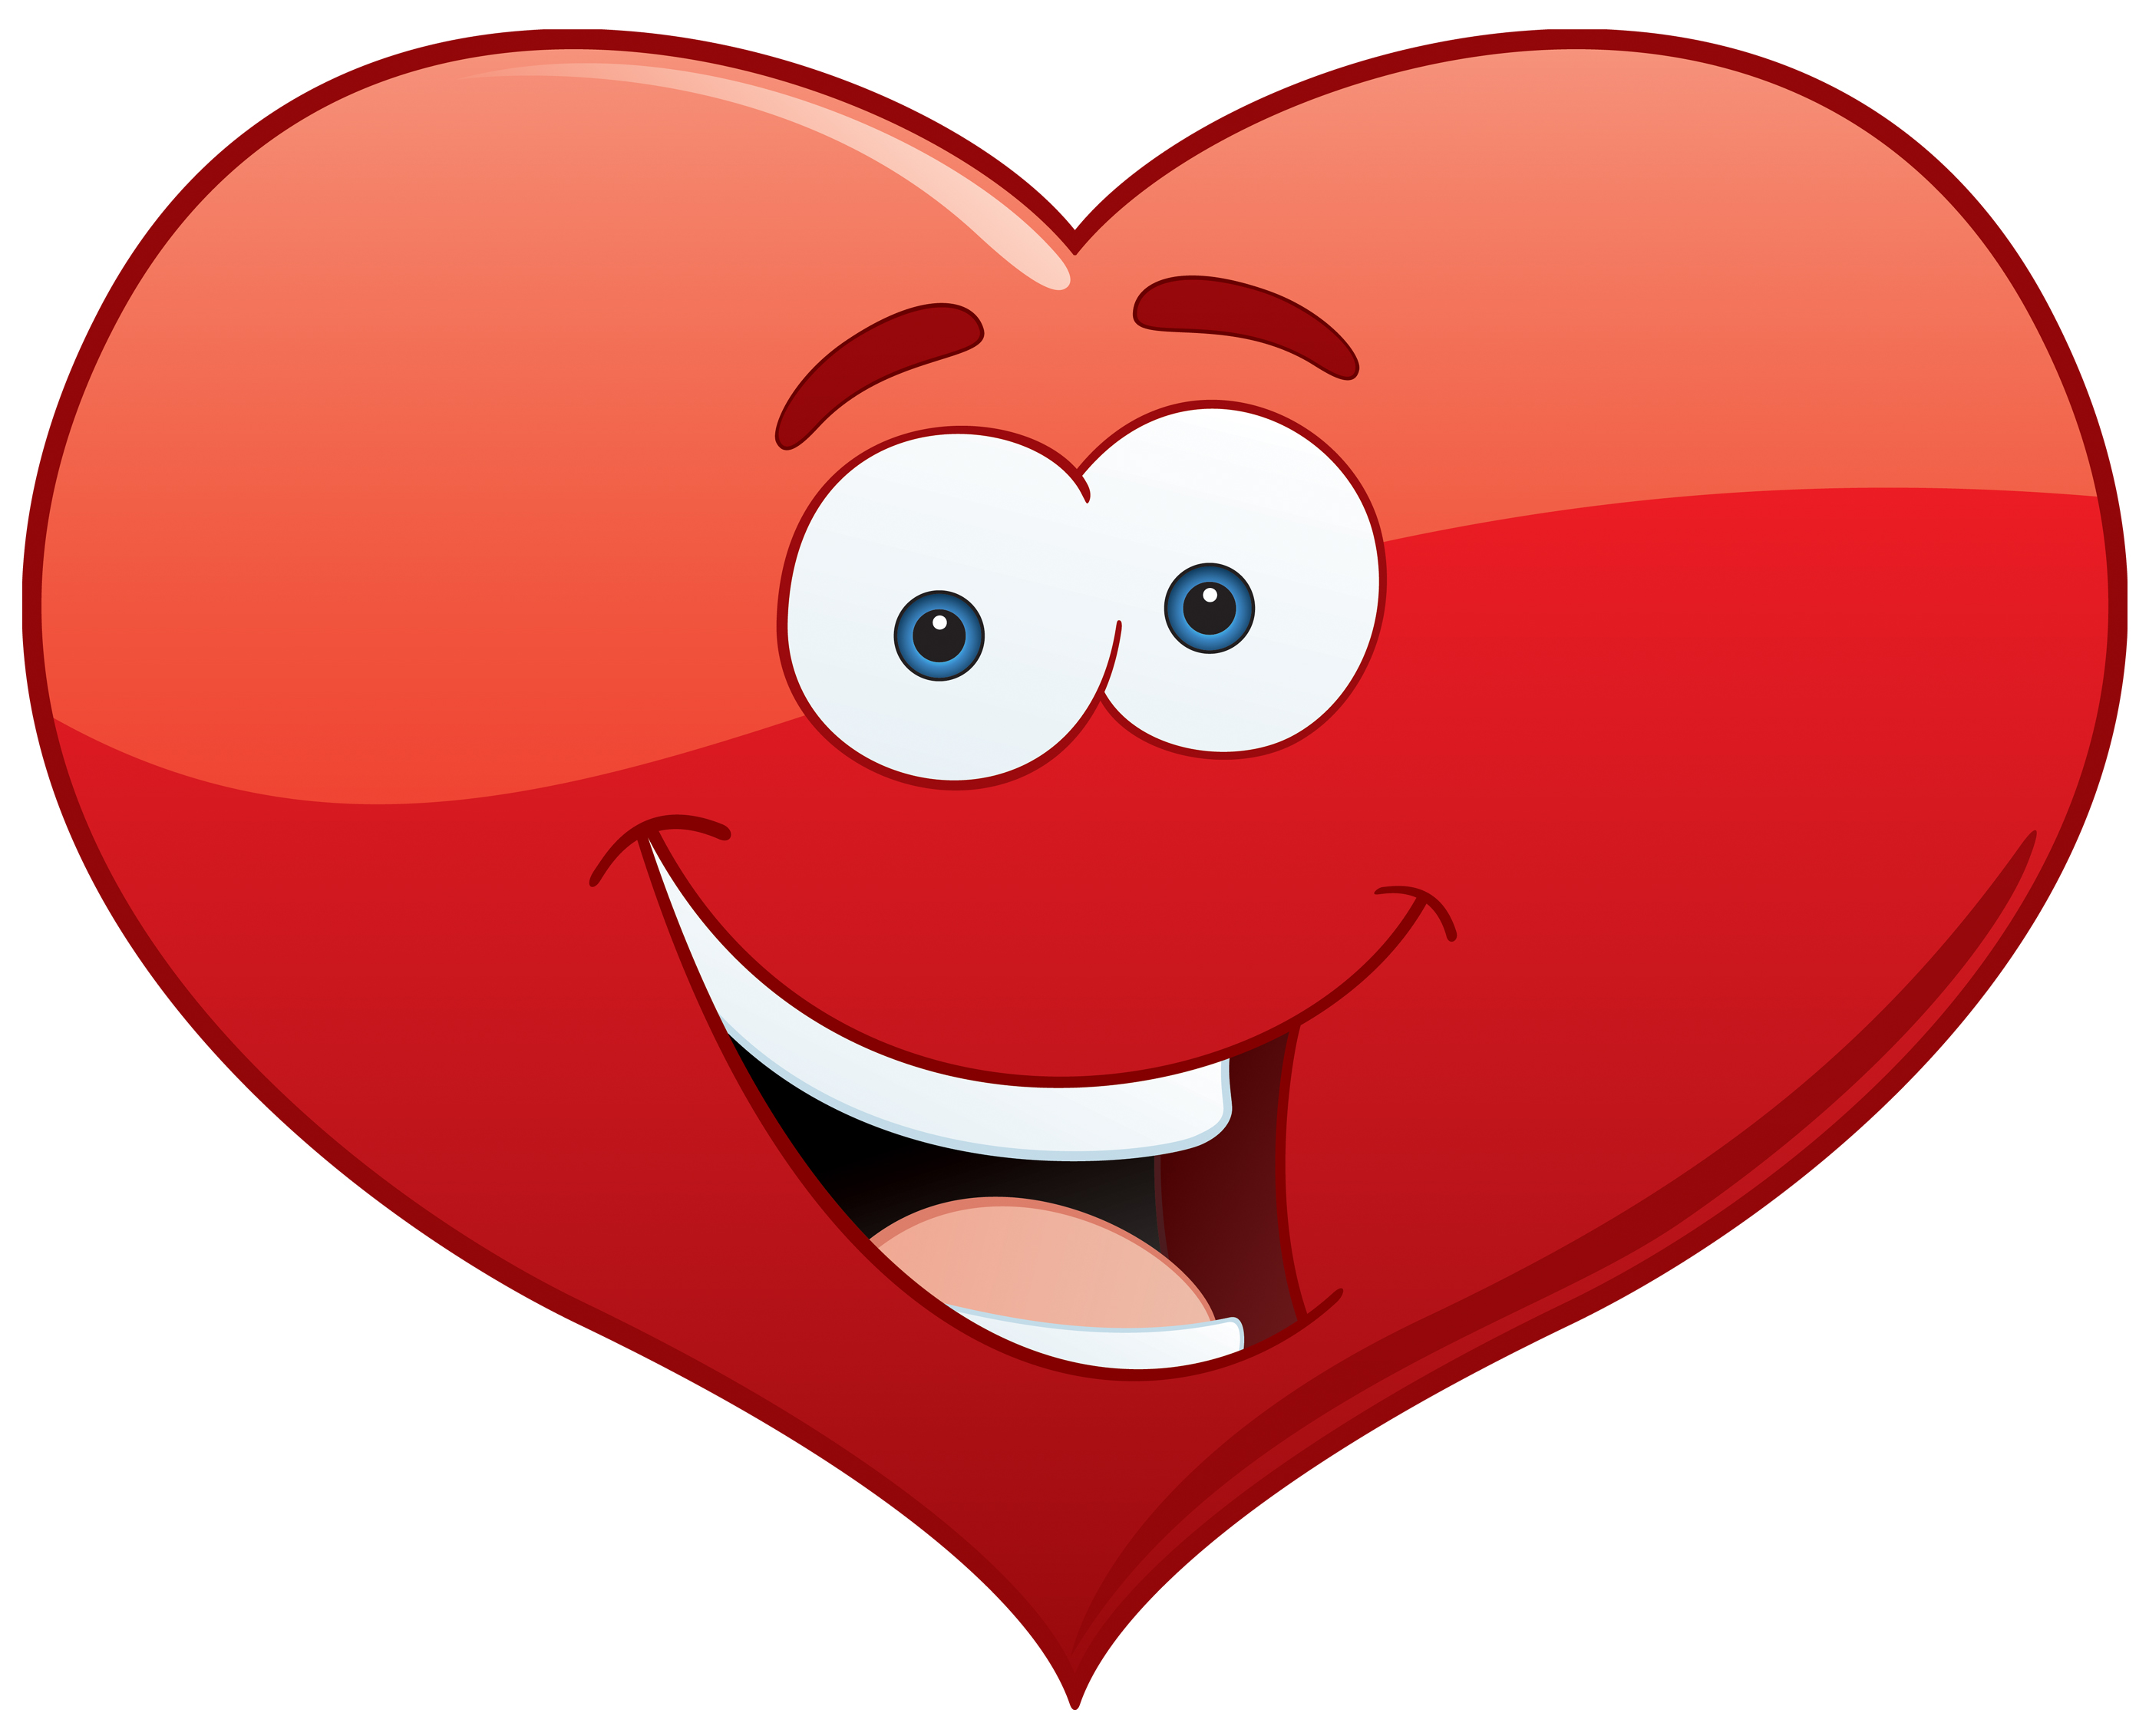 Citaten Goed Hart : Glimlach delen space van ronald